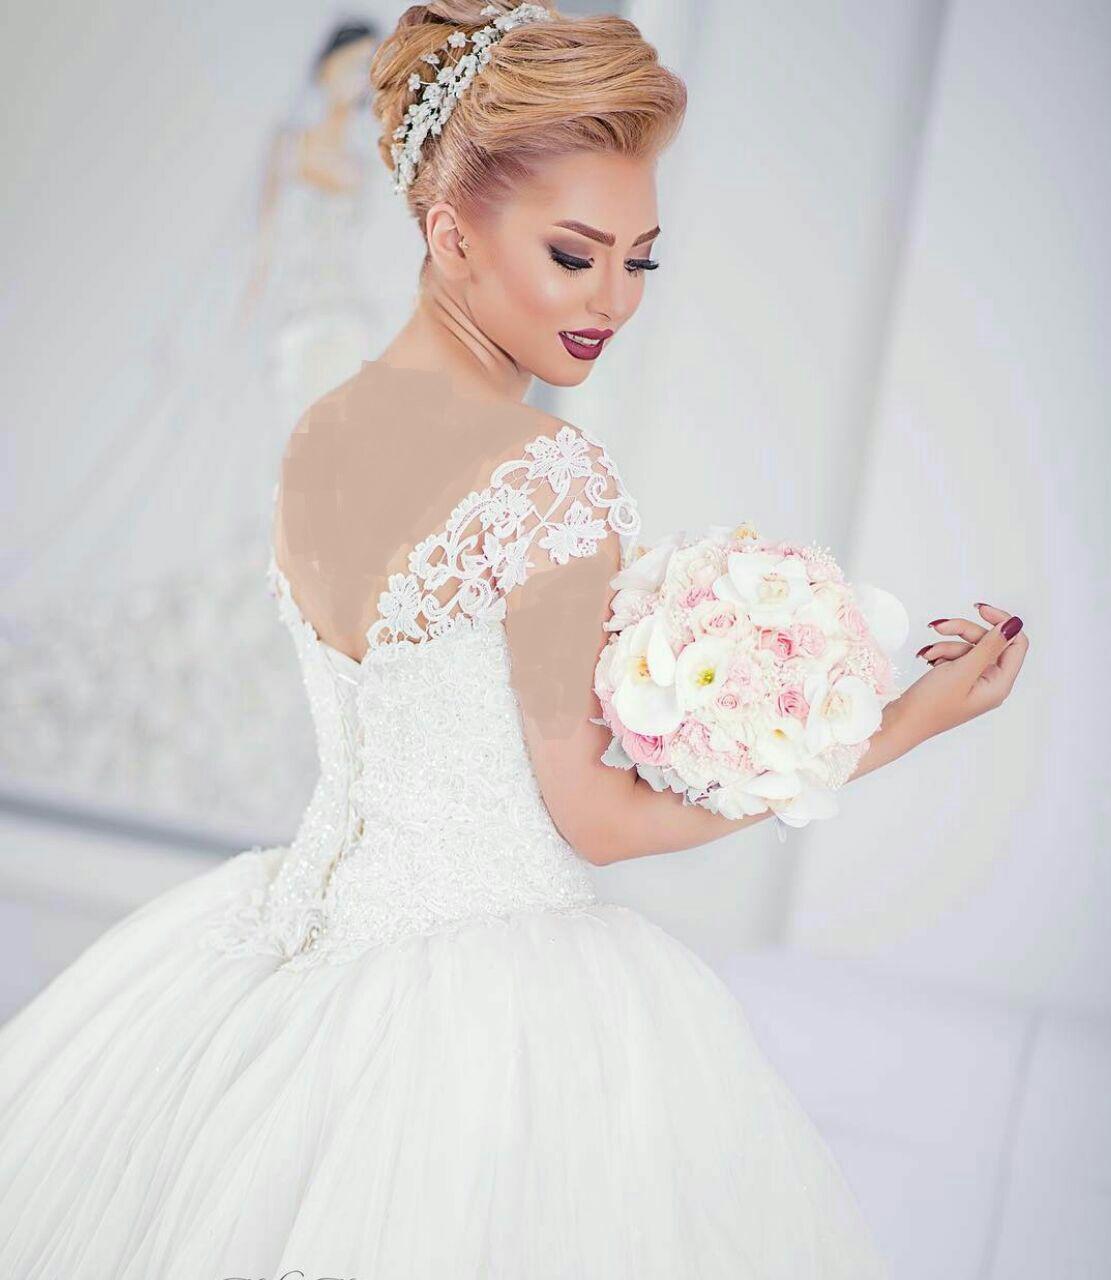 Aroos 7 مدل لباس عروس 2018؛ شیک ترین مدل لباس نامزدی مجلسی 97 مدل لباس